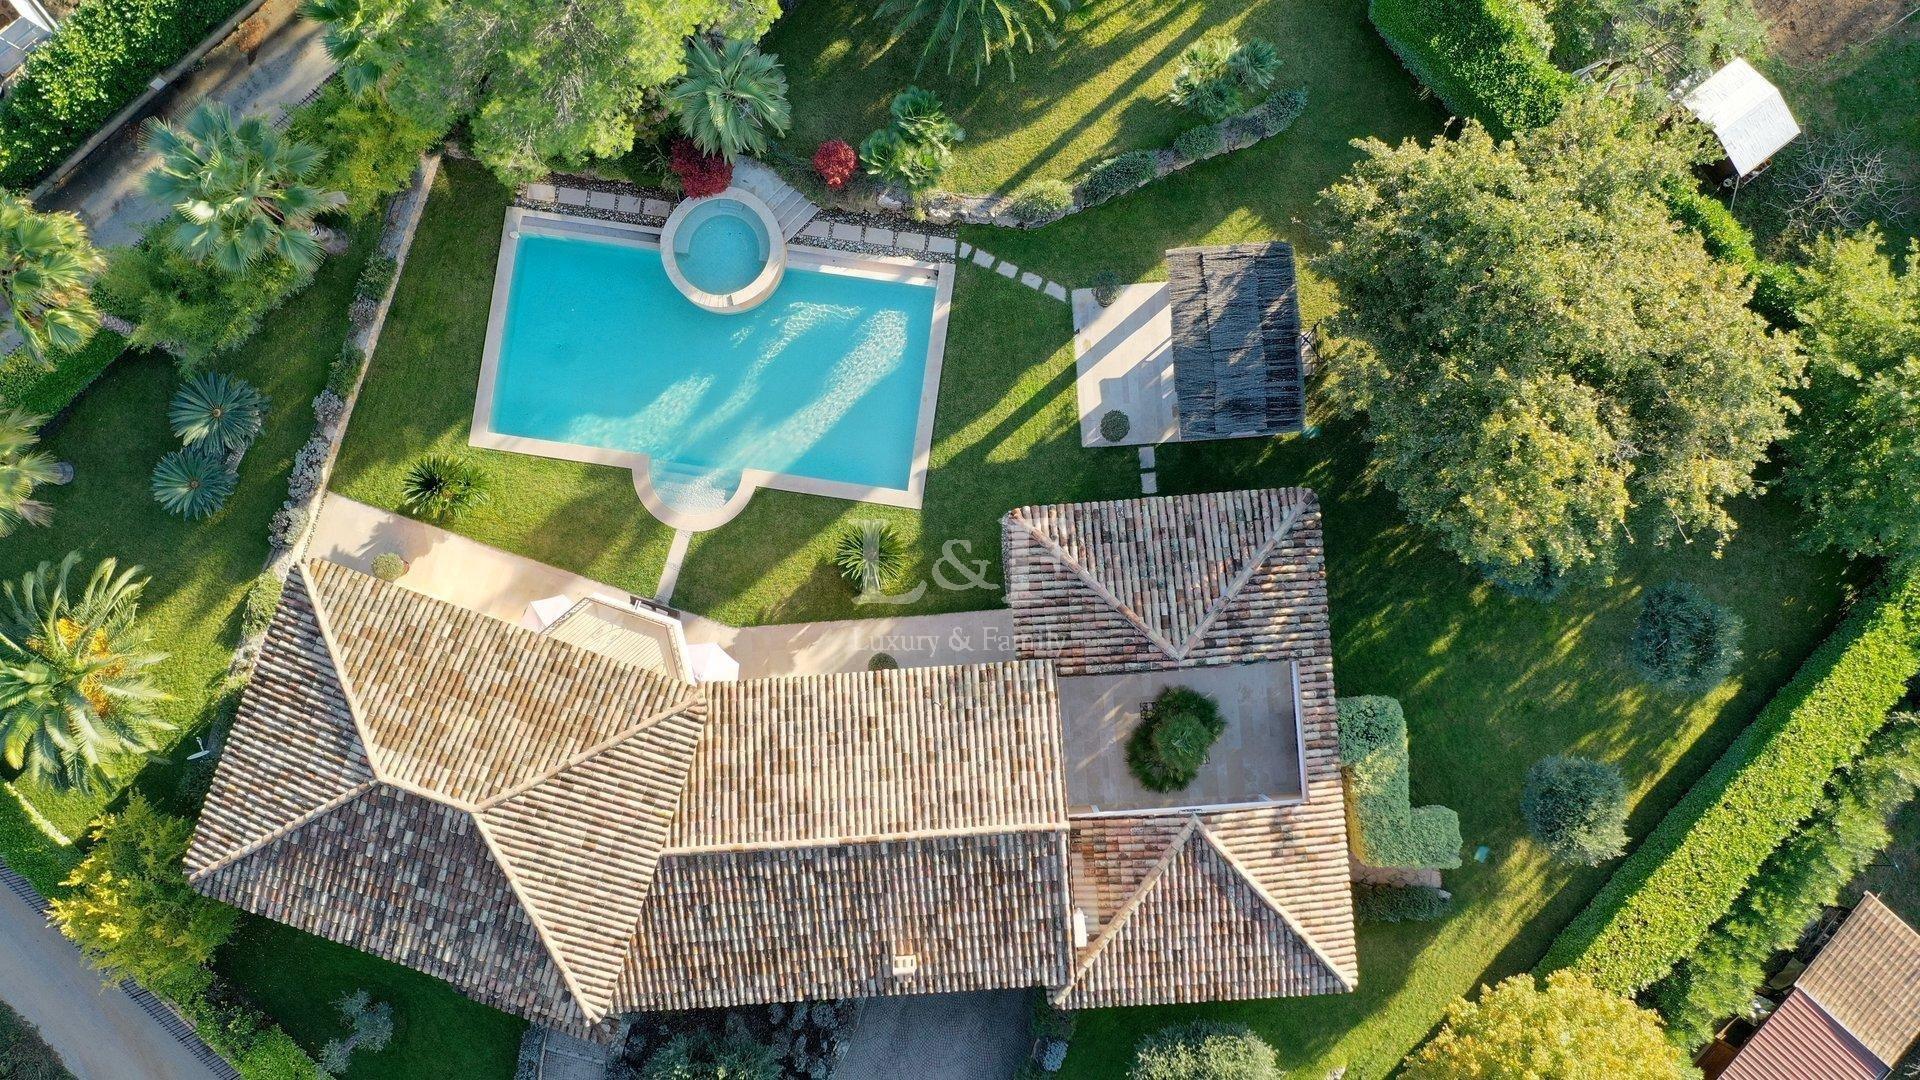 Villa in Mougins, Provence-Alpes-Côte d'Azur, France 1 - 10745430